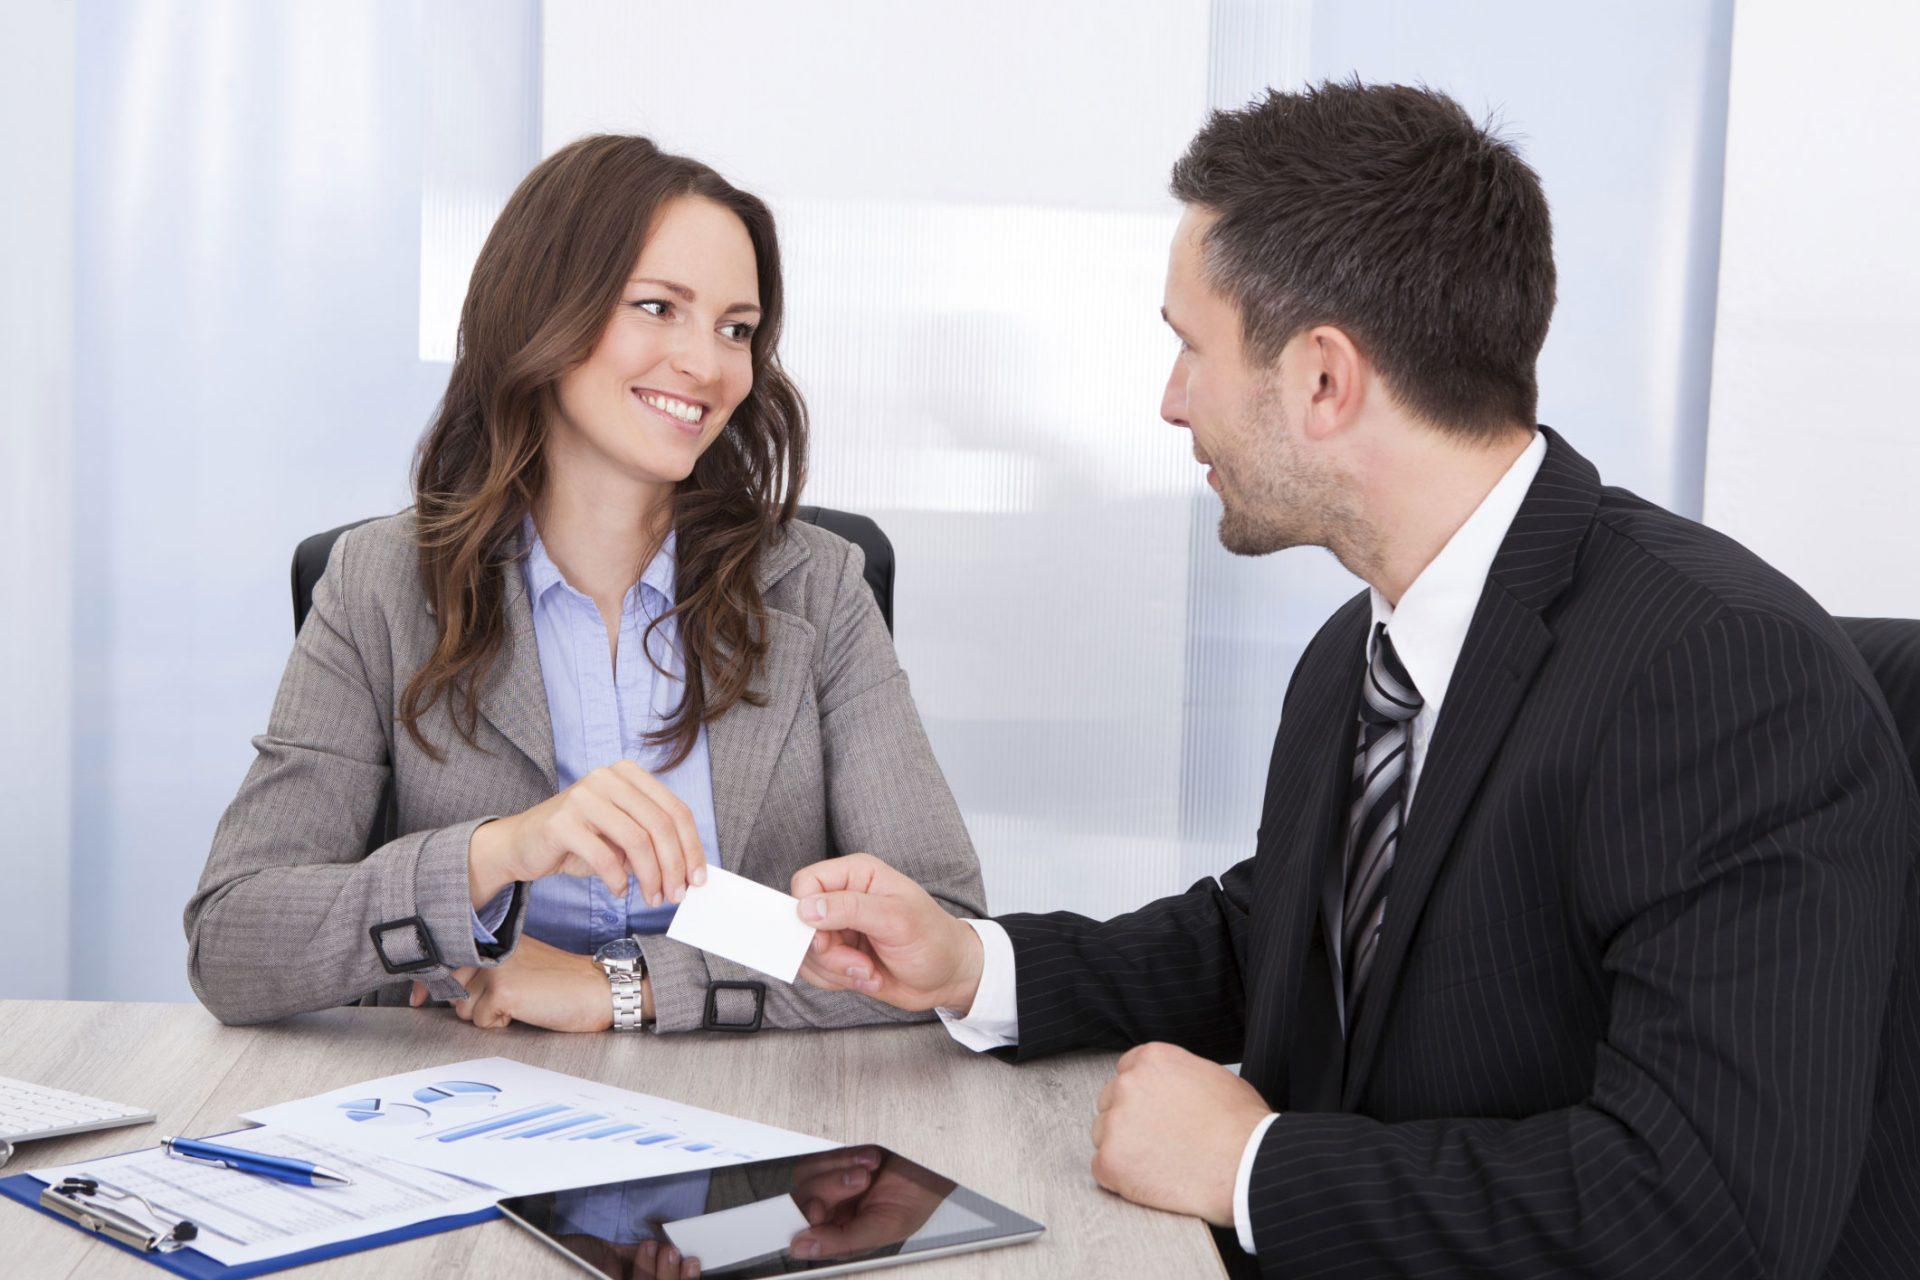 Training Handling Customer Objections